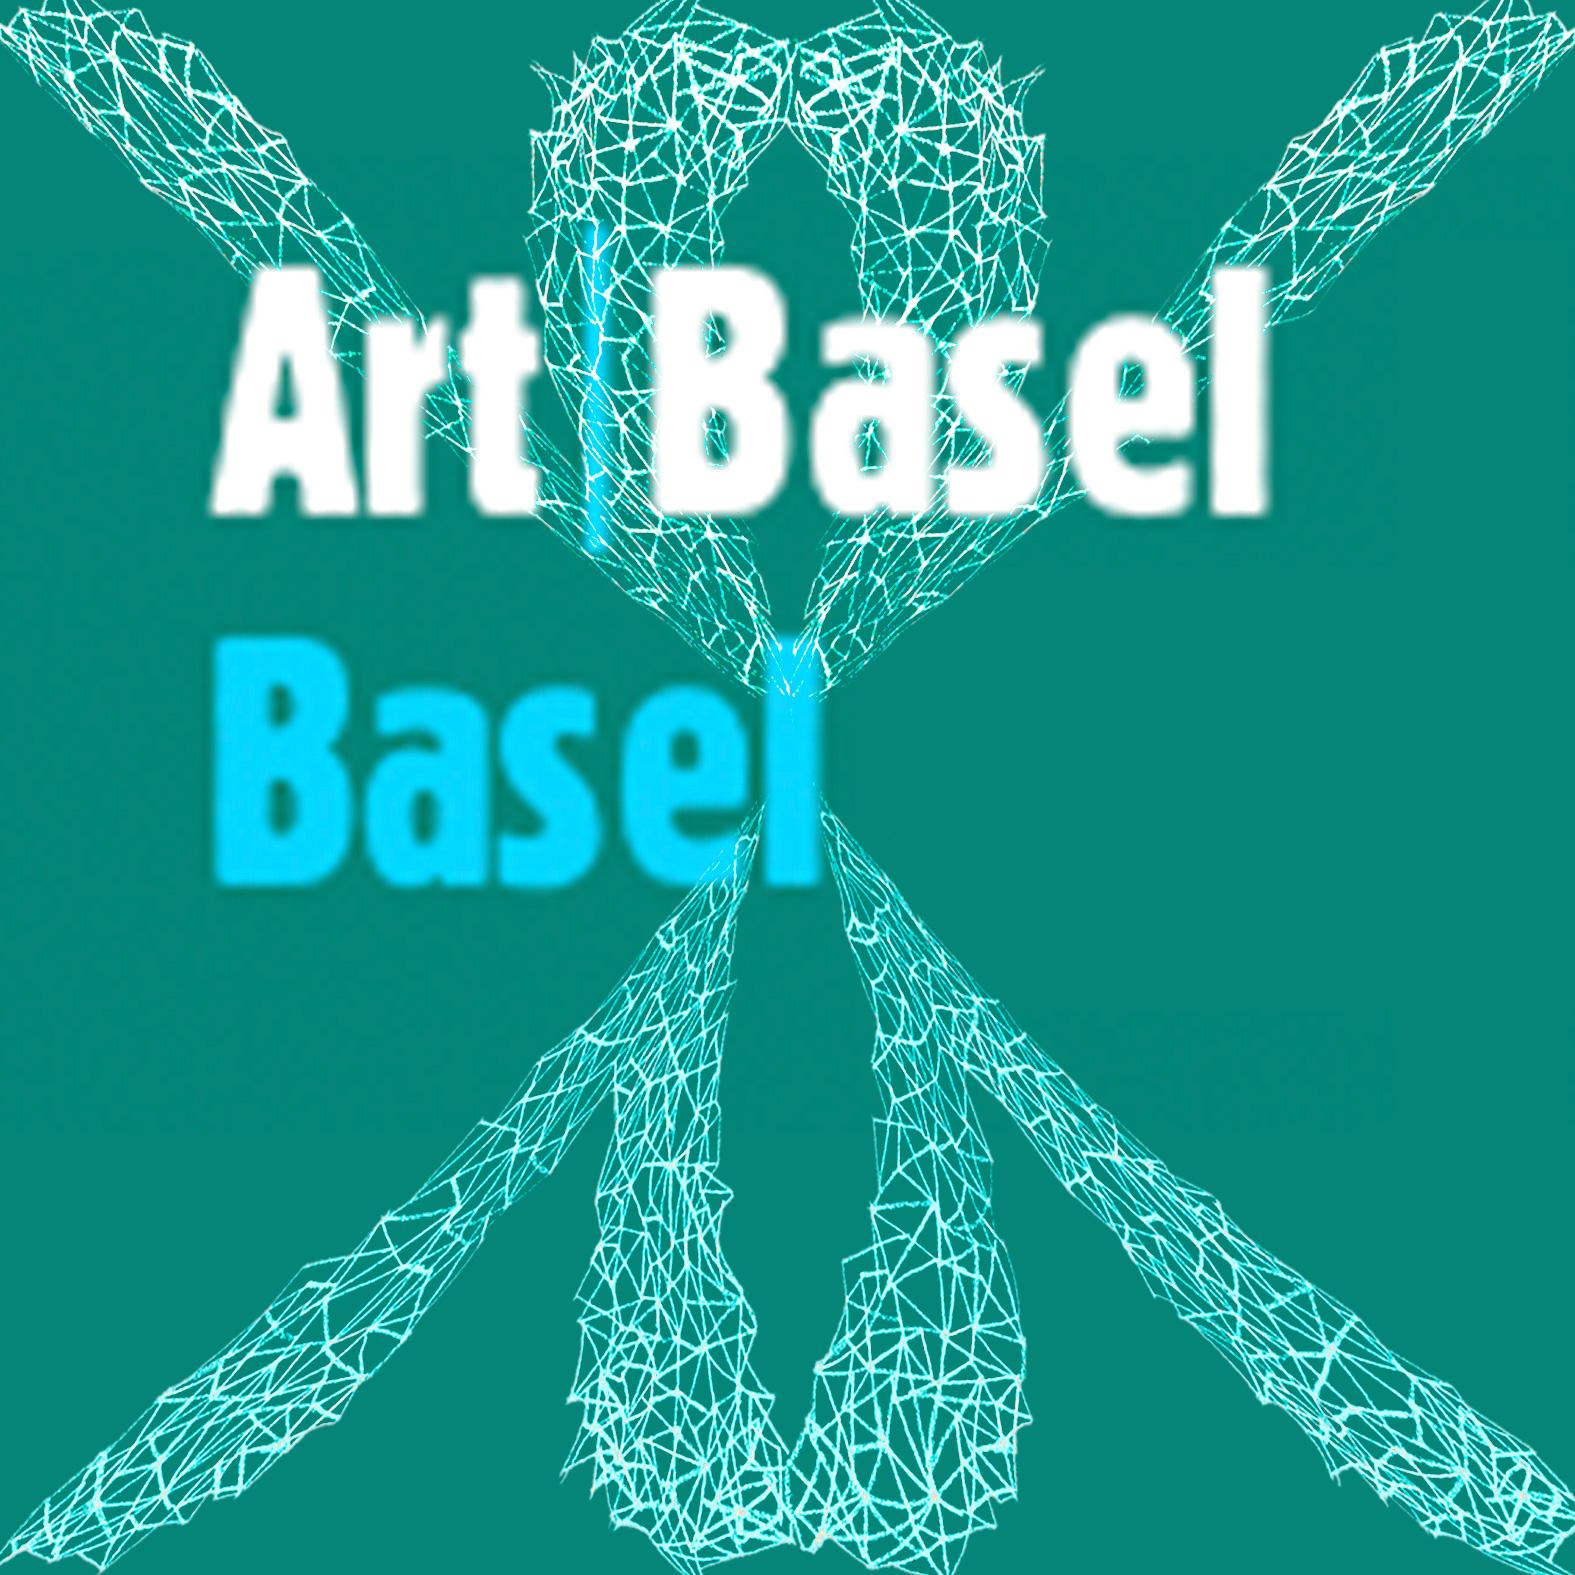 art basel 2014 performance